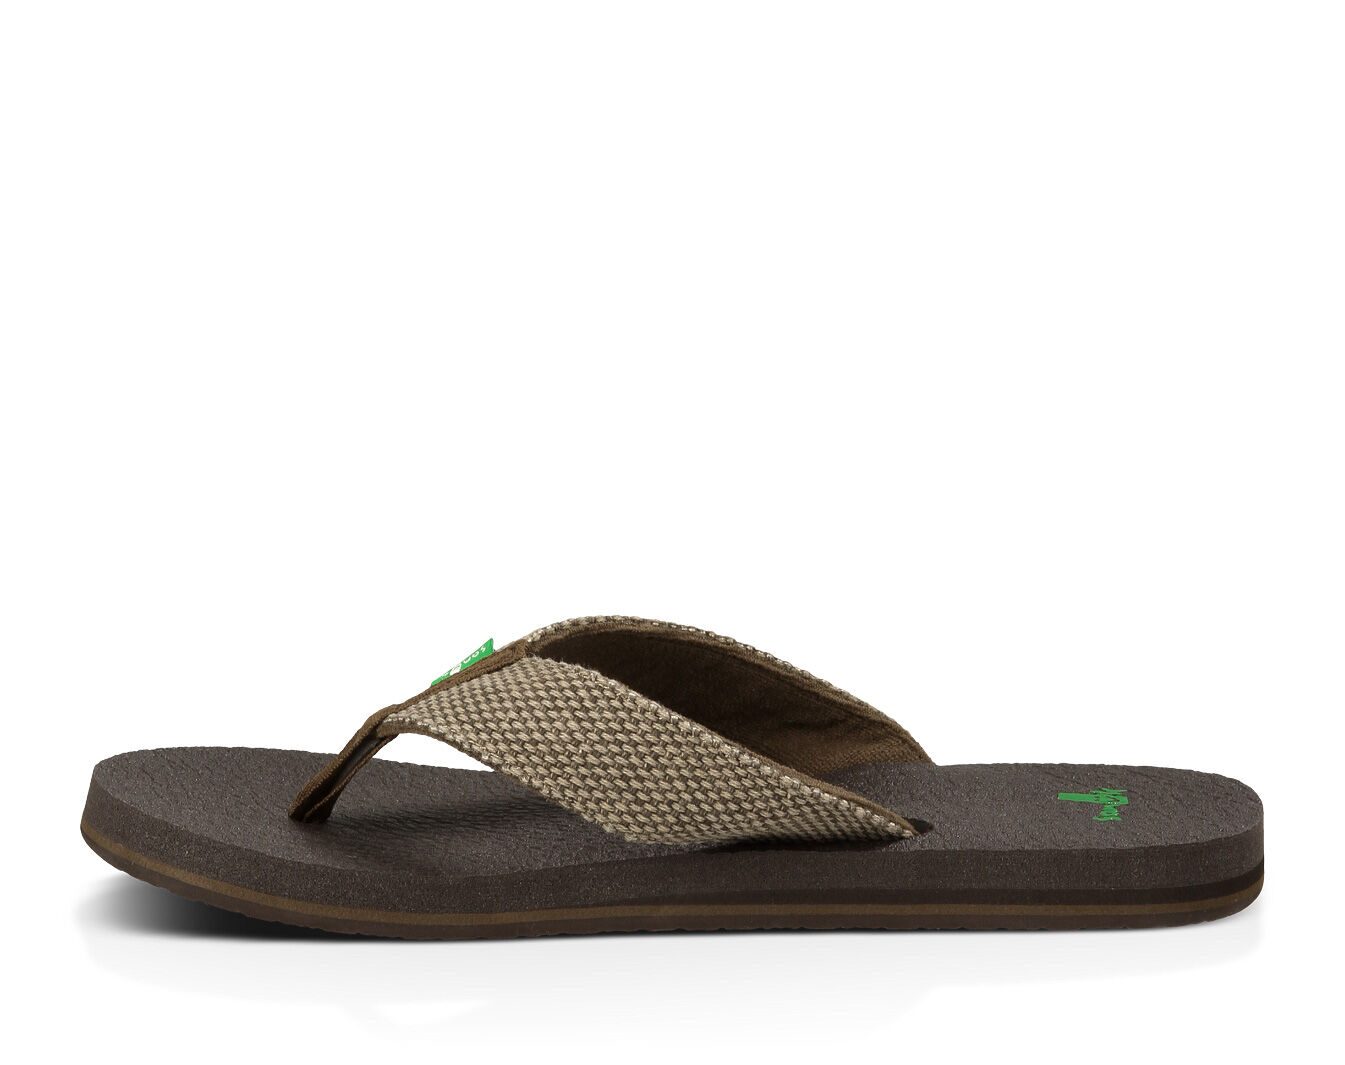 NEW Men/'s SANUK M YOGI 4 BROWN WEAVE flip flop sandal size 7 8